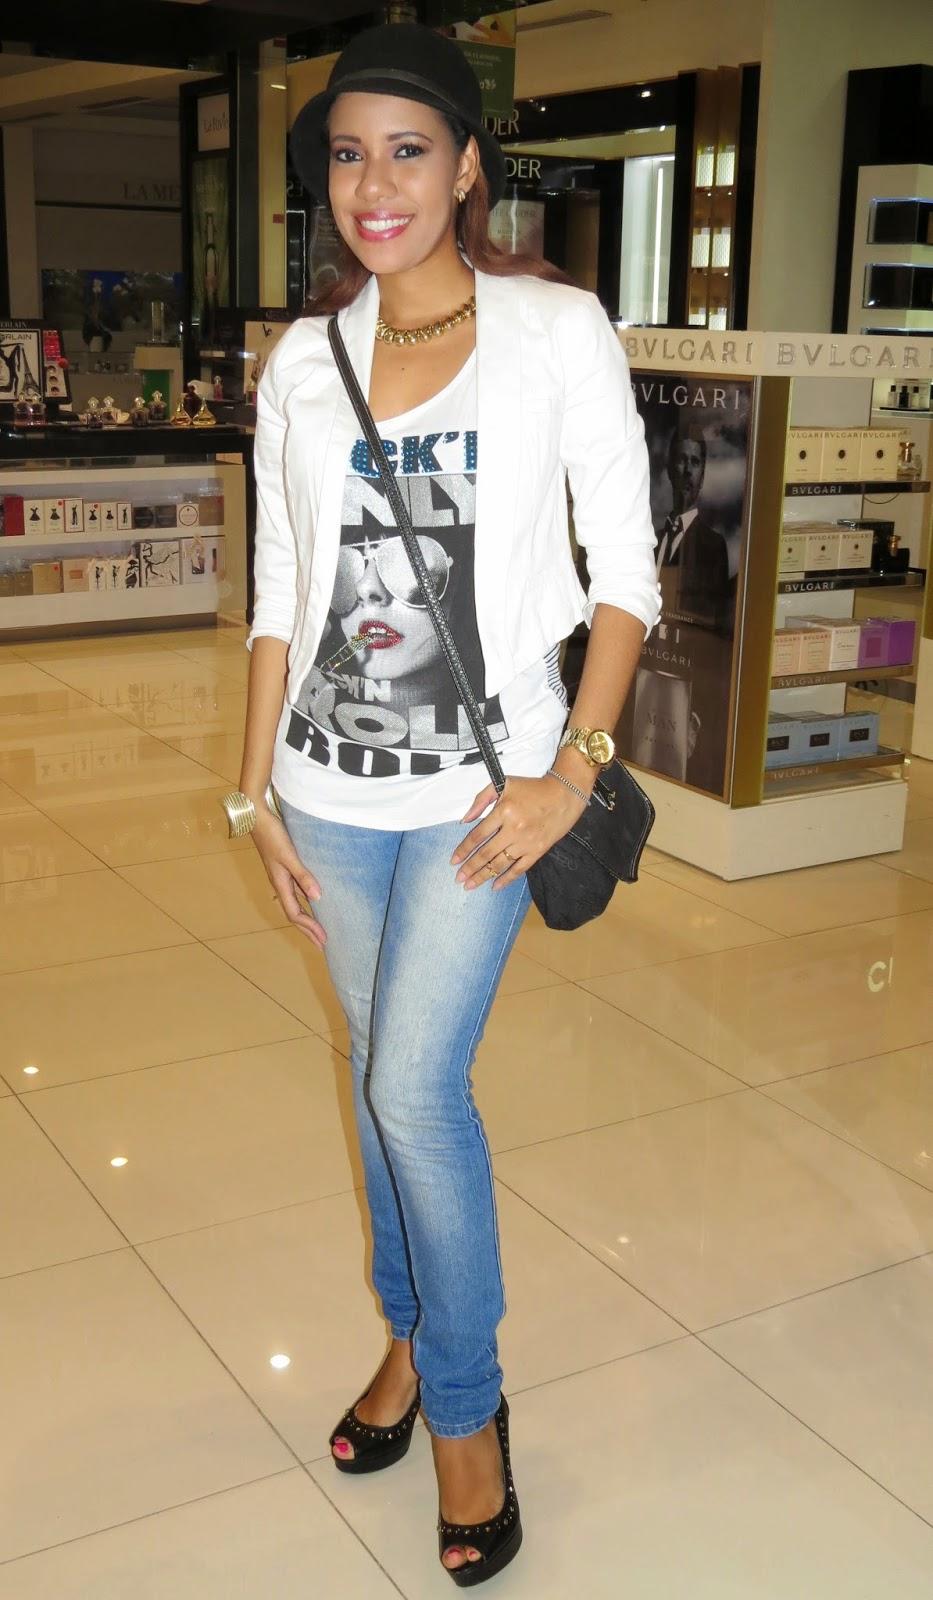 Princesa Miel Blog (Outfit) Look Casual Chic / Opciu00f3n Du00eda Lluvioso